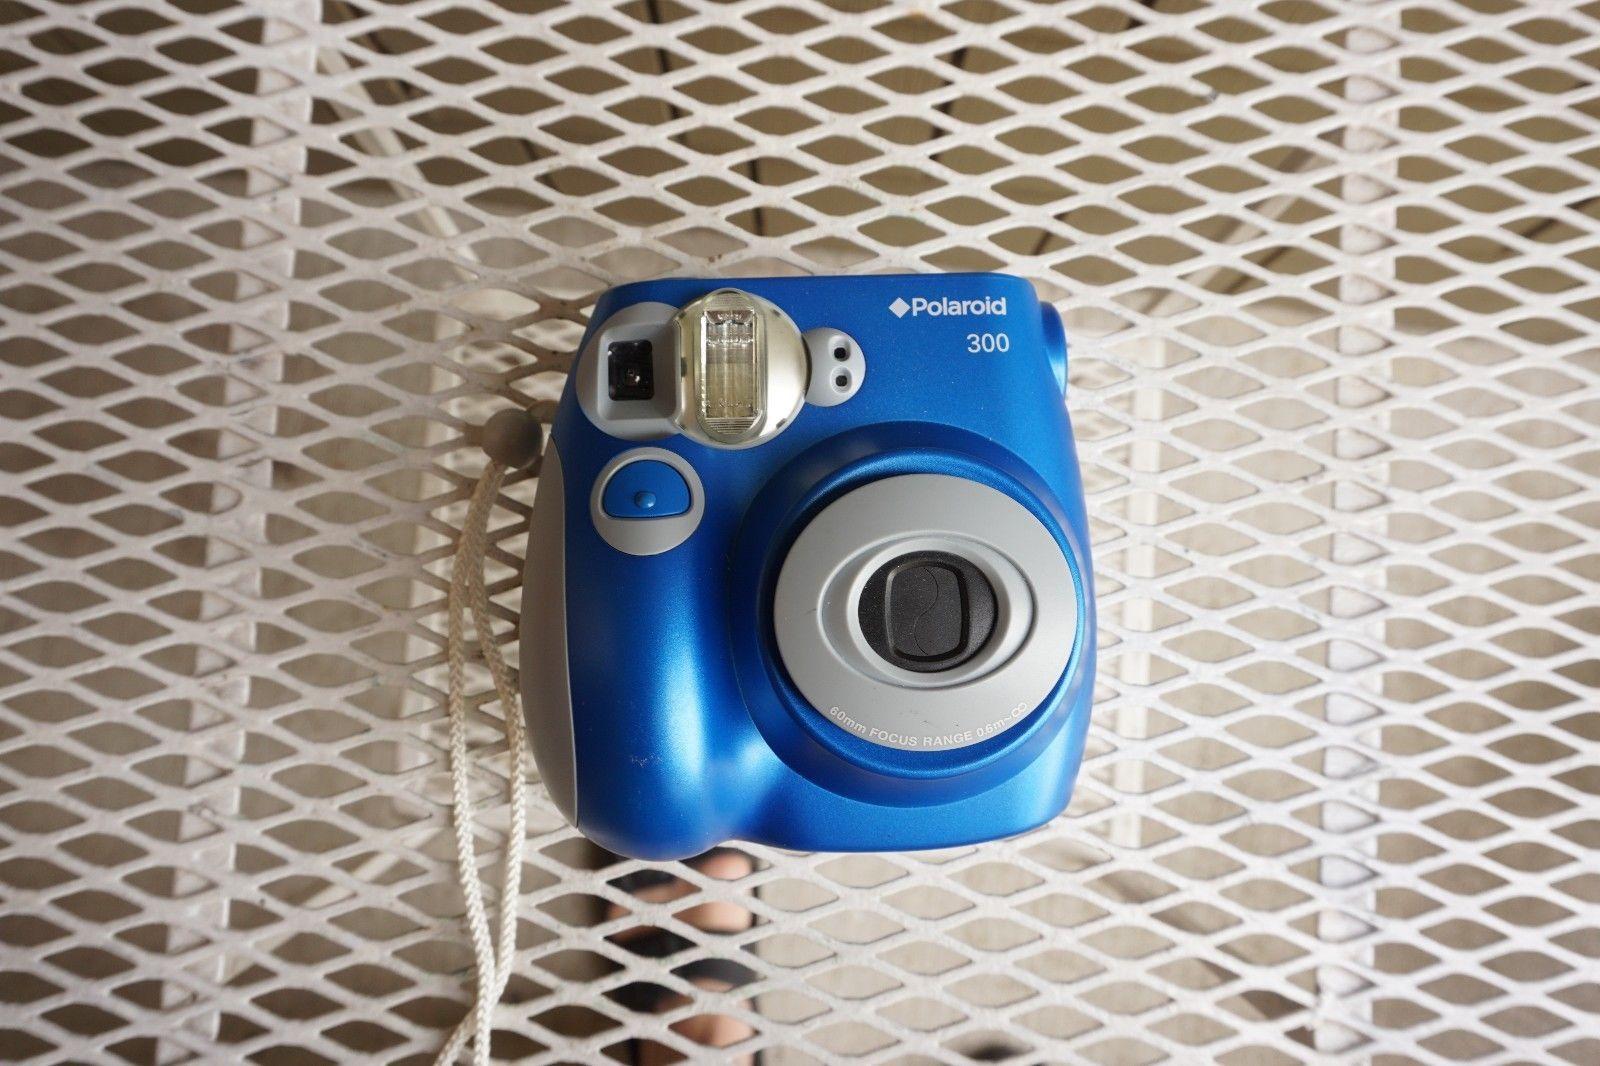 c22e364f6f A+ Polaroid 300 3.2MP Digital Camera Blue Instant Film Wedding Photo Booth  Party